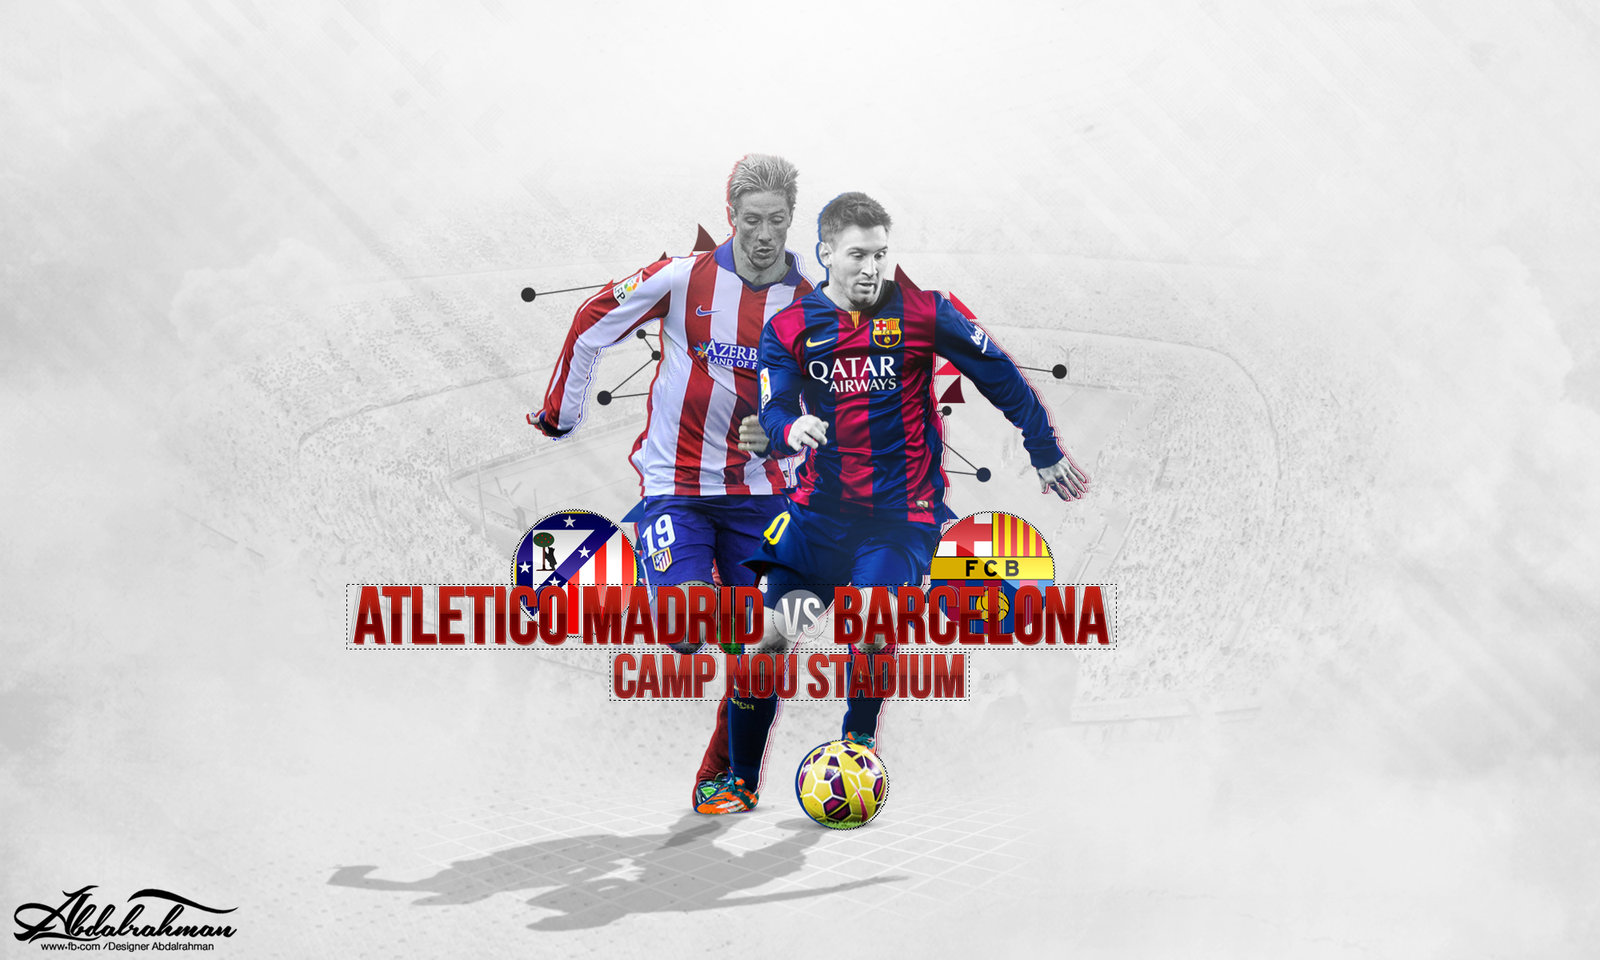 wallpaper atletico madrid vs barcelona by Designer Abdalrahman on 1600x960